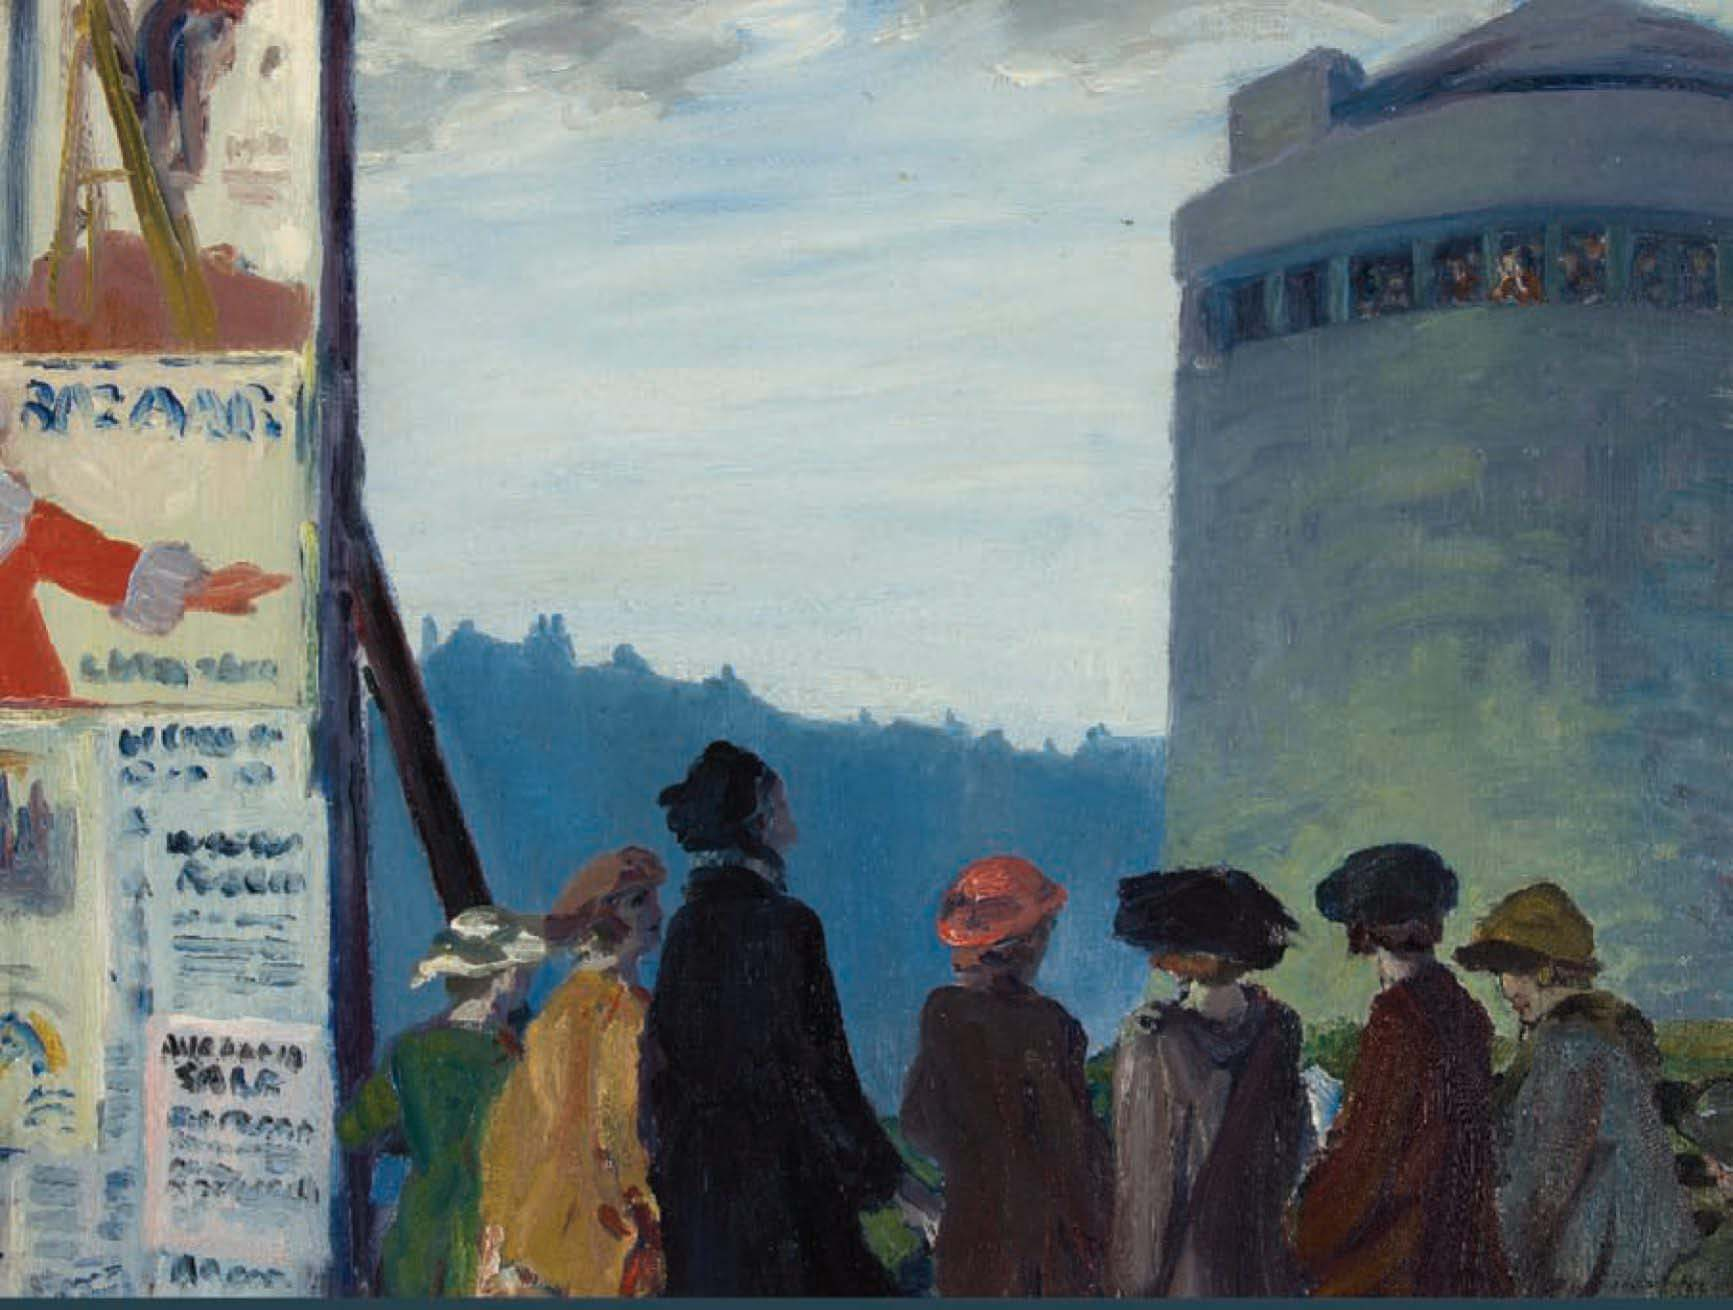 GROUNDBREAKING: Women and the Irish Revolution examines the role that women played in Ireland's revolutionary movements